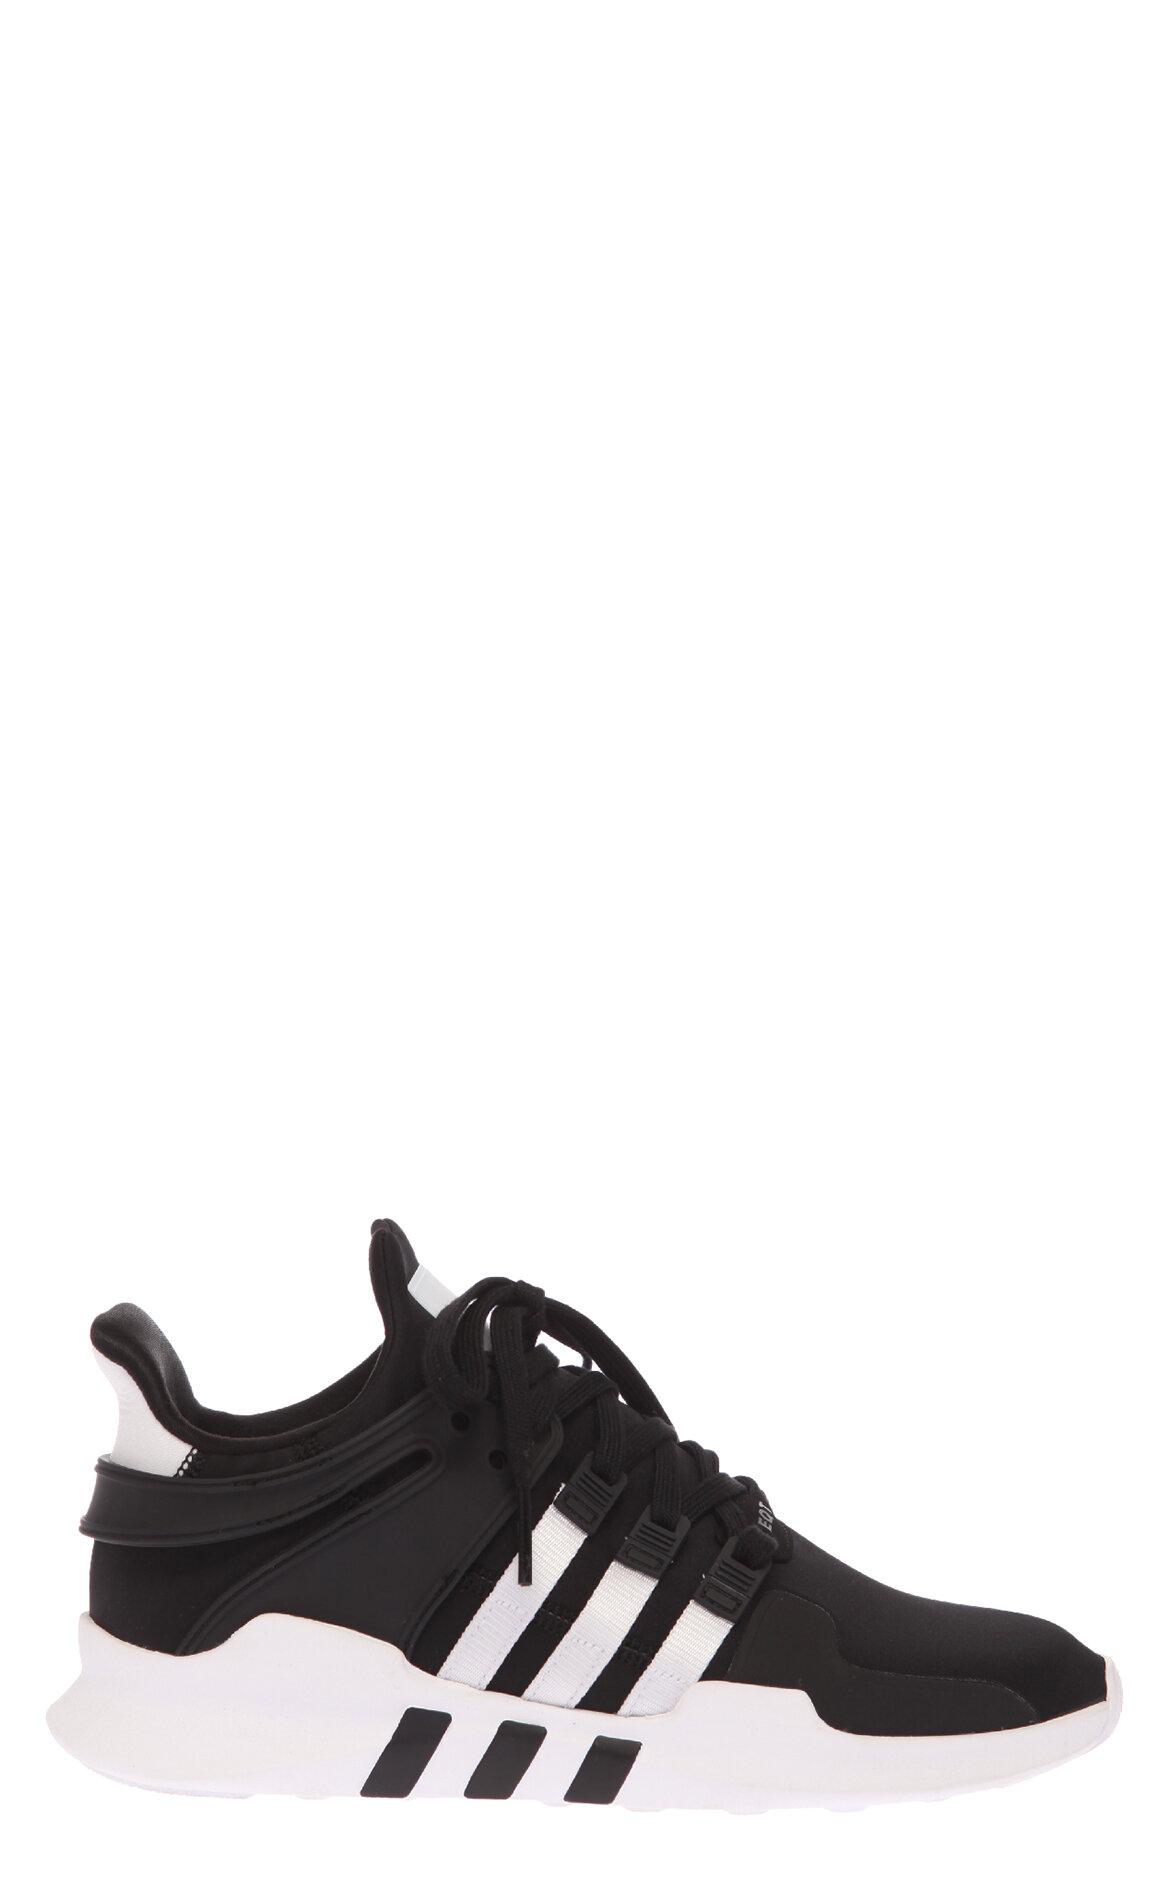 adidas originals Eqt Support Ayakkabı